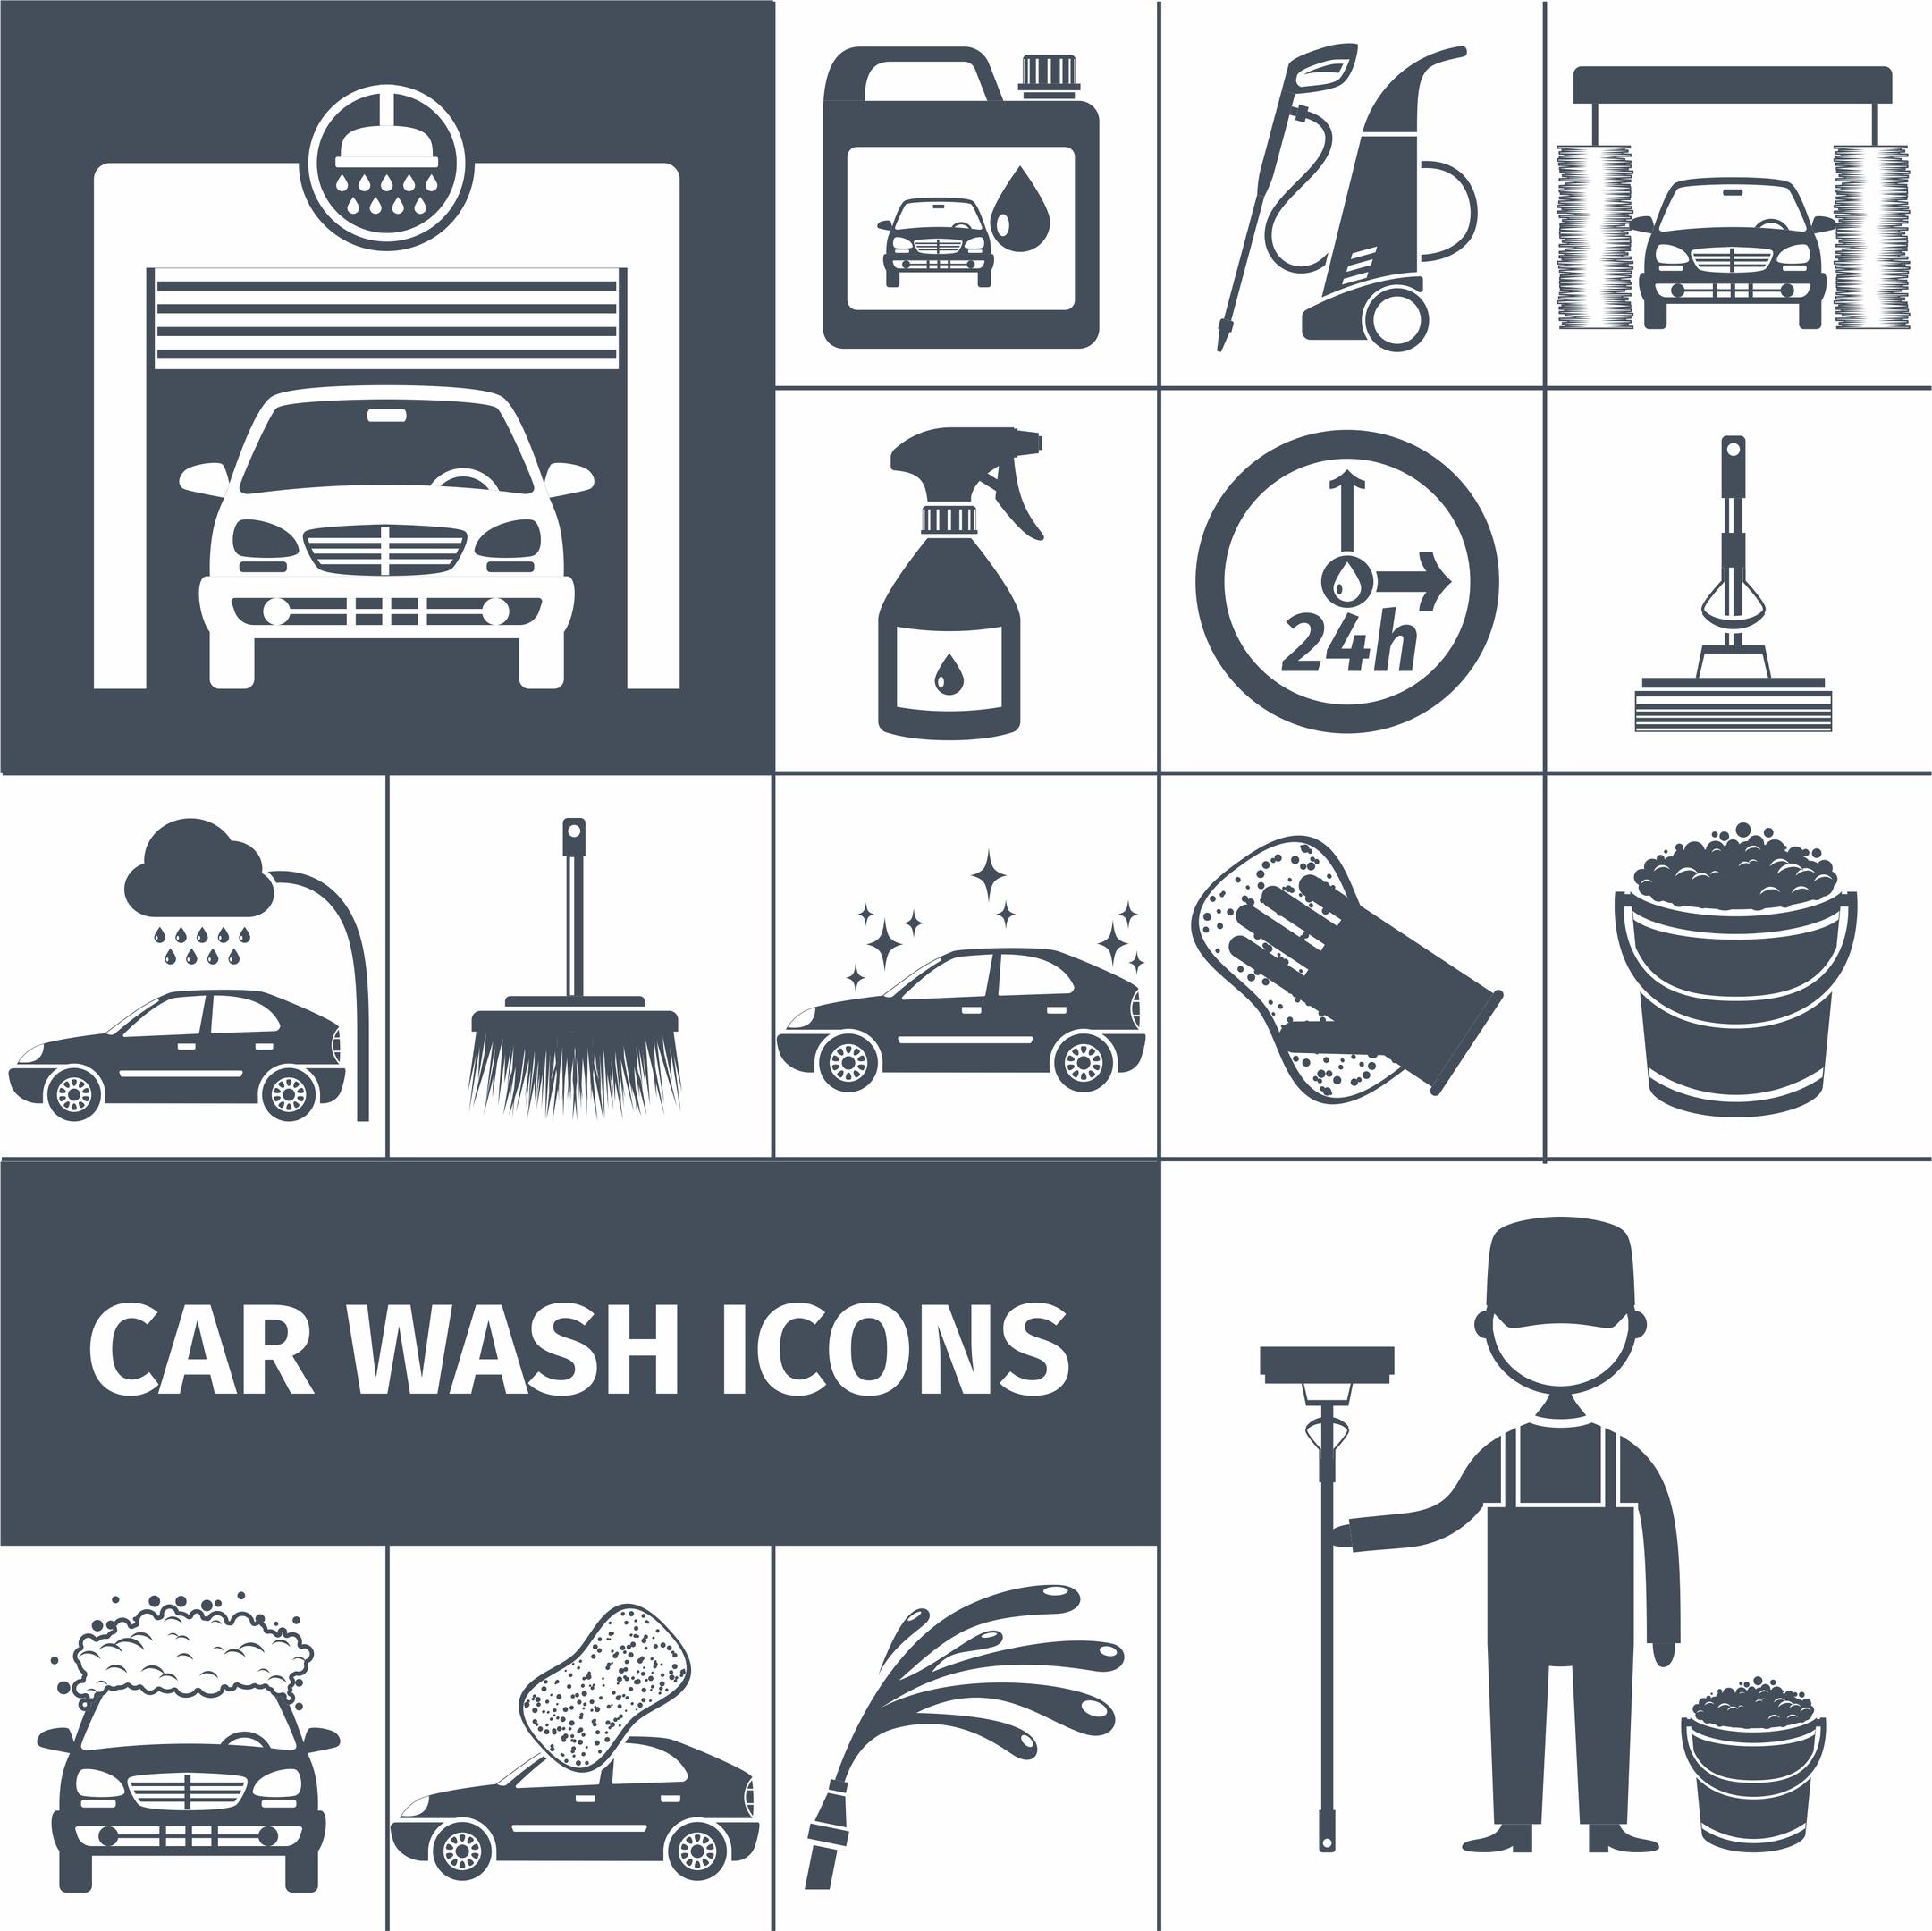 Car Wash Icons Free Vector